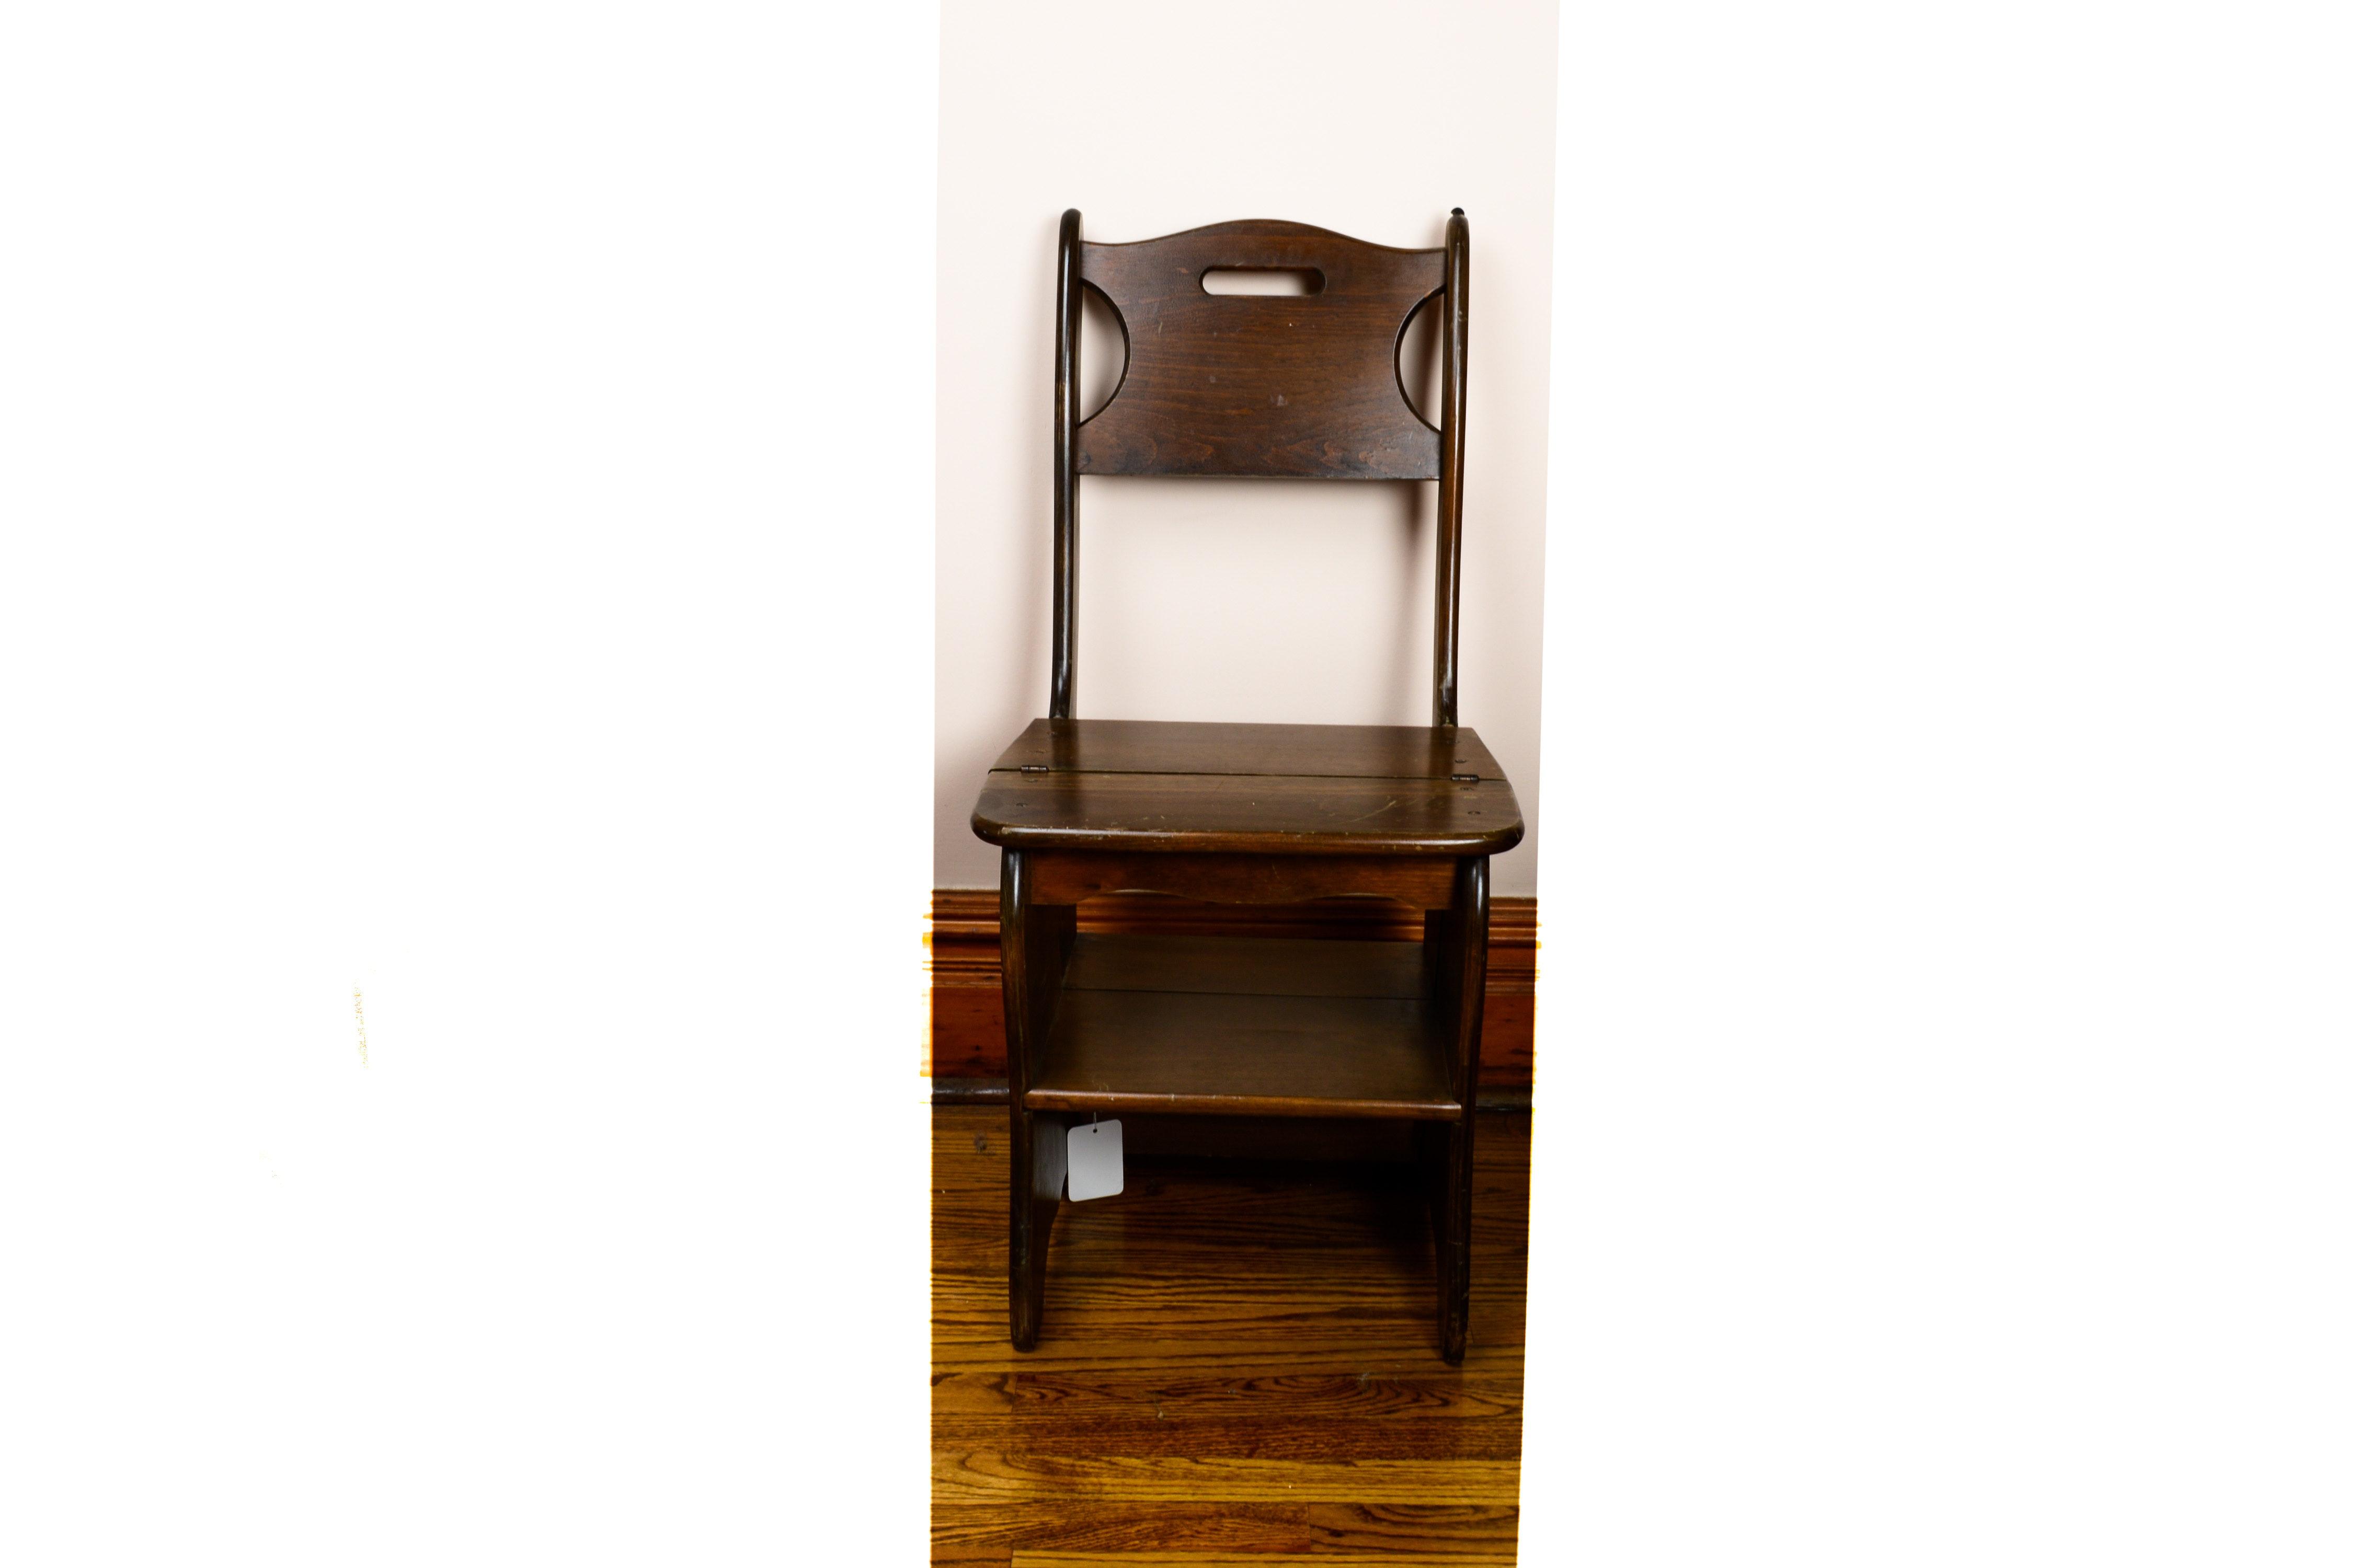 Franklin Style Metamorphic Library Chair Ladder Ebth Rh Ebth Com Chair  Ladder Combination Benjamin Franklin Library